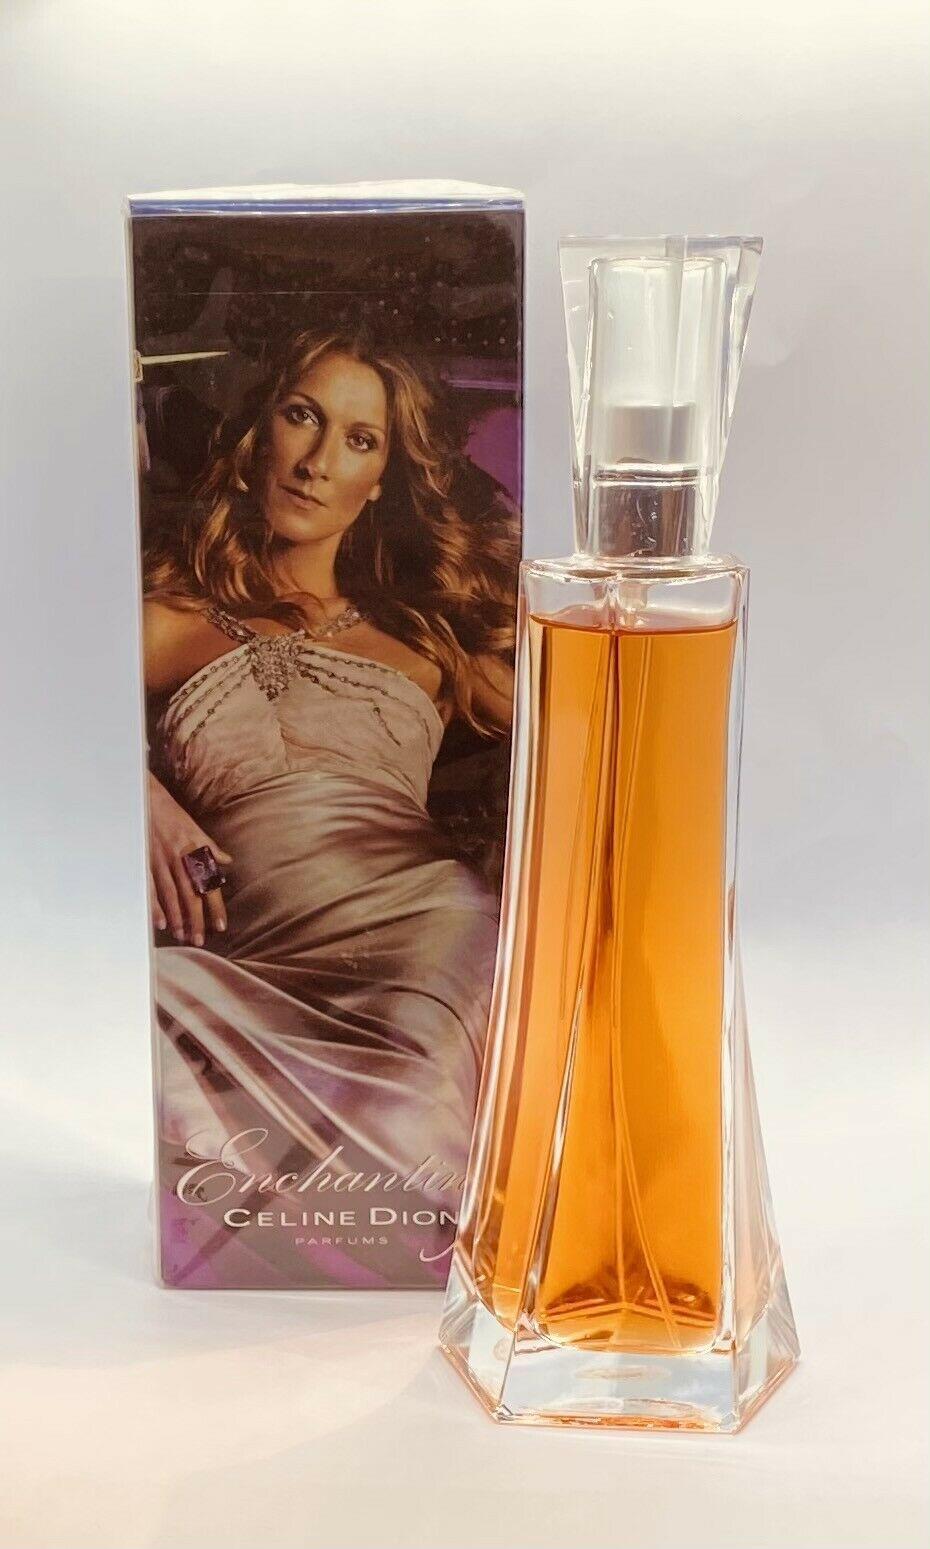 Enchanting Celine Dion Perfume For Women 100ml / 3.4 fl.oz EDT Spray - $158.55